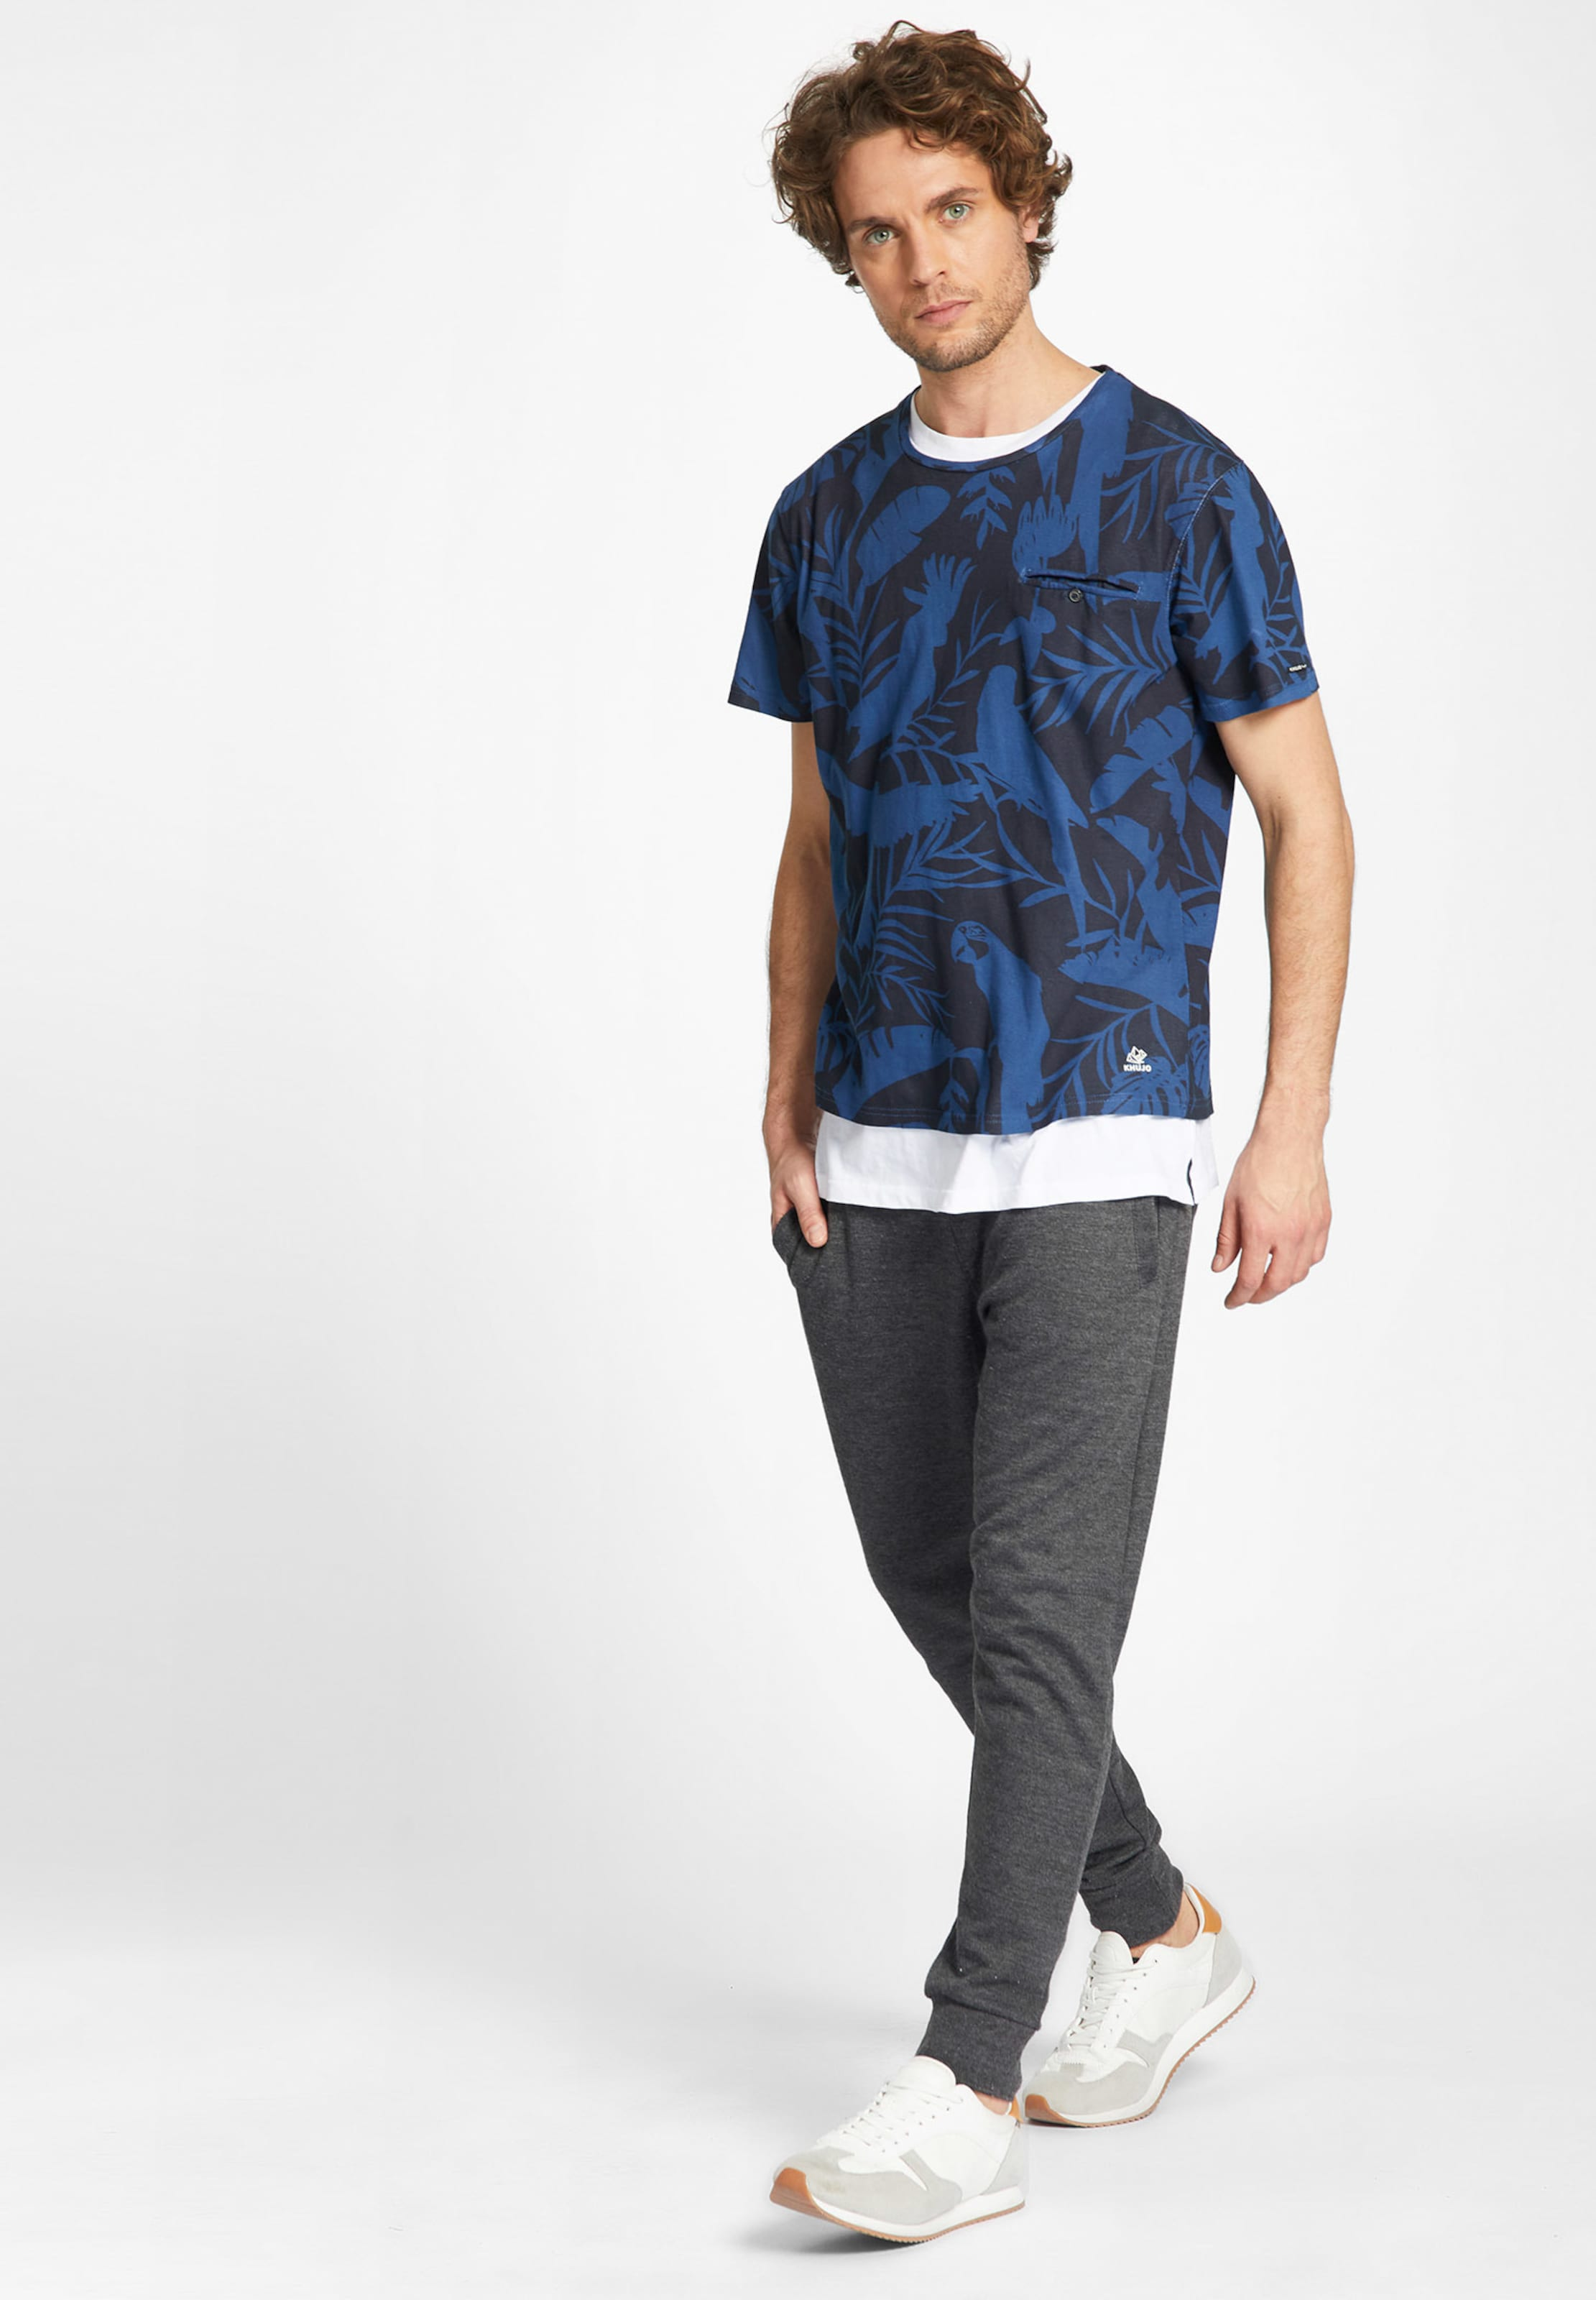 Khujo BlauSchwarz 'tevarez' In In Shirt 'tevarez' Shirt BlauSchwarz Khujo Qshtrd